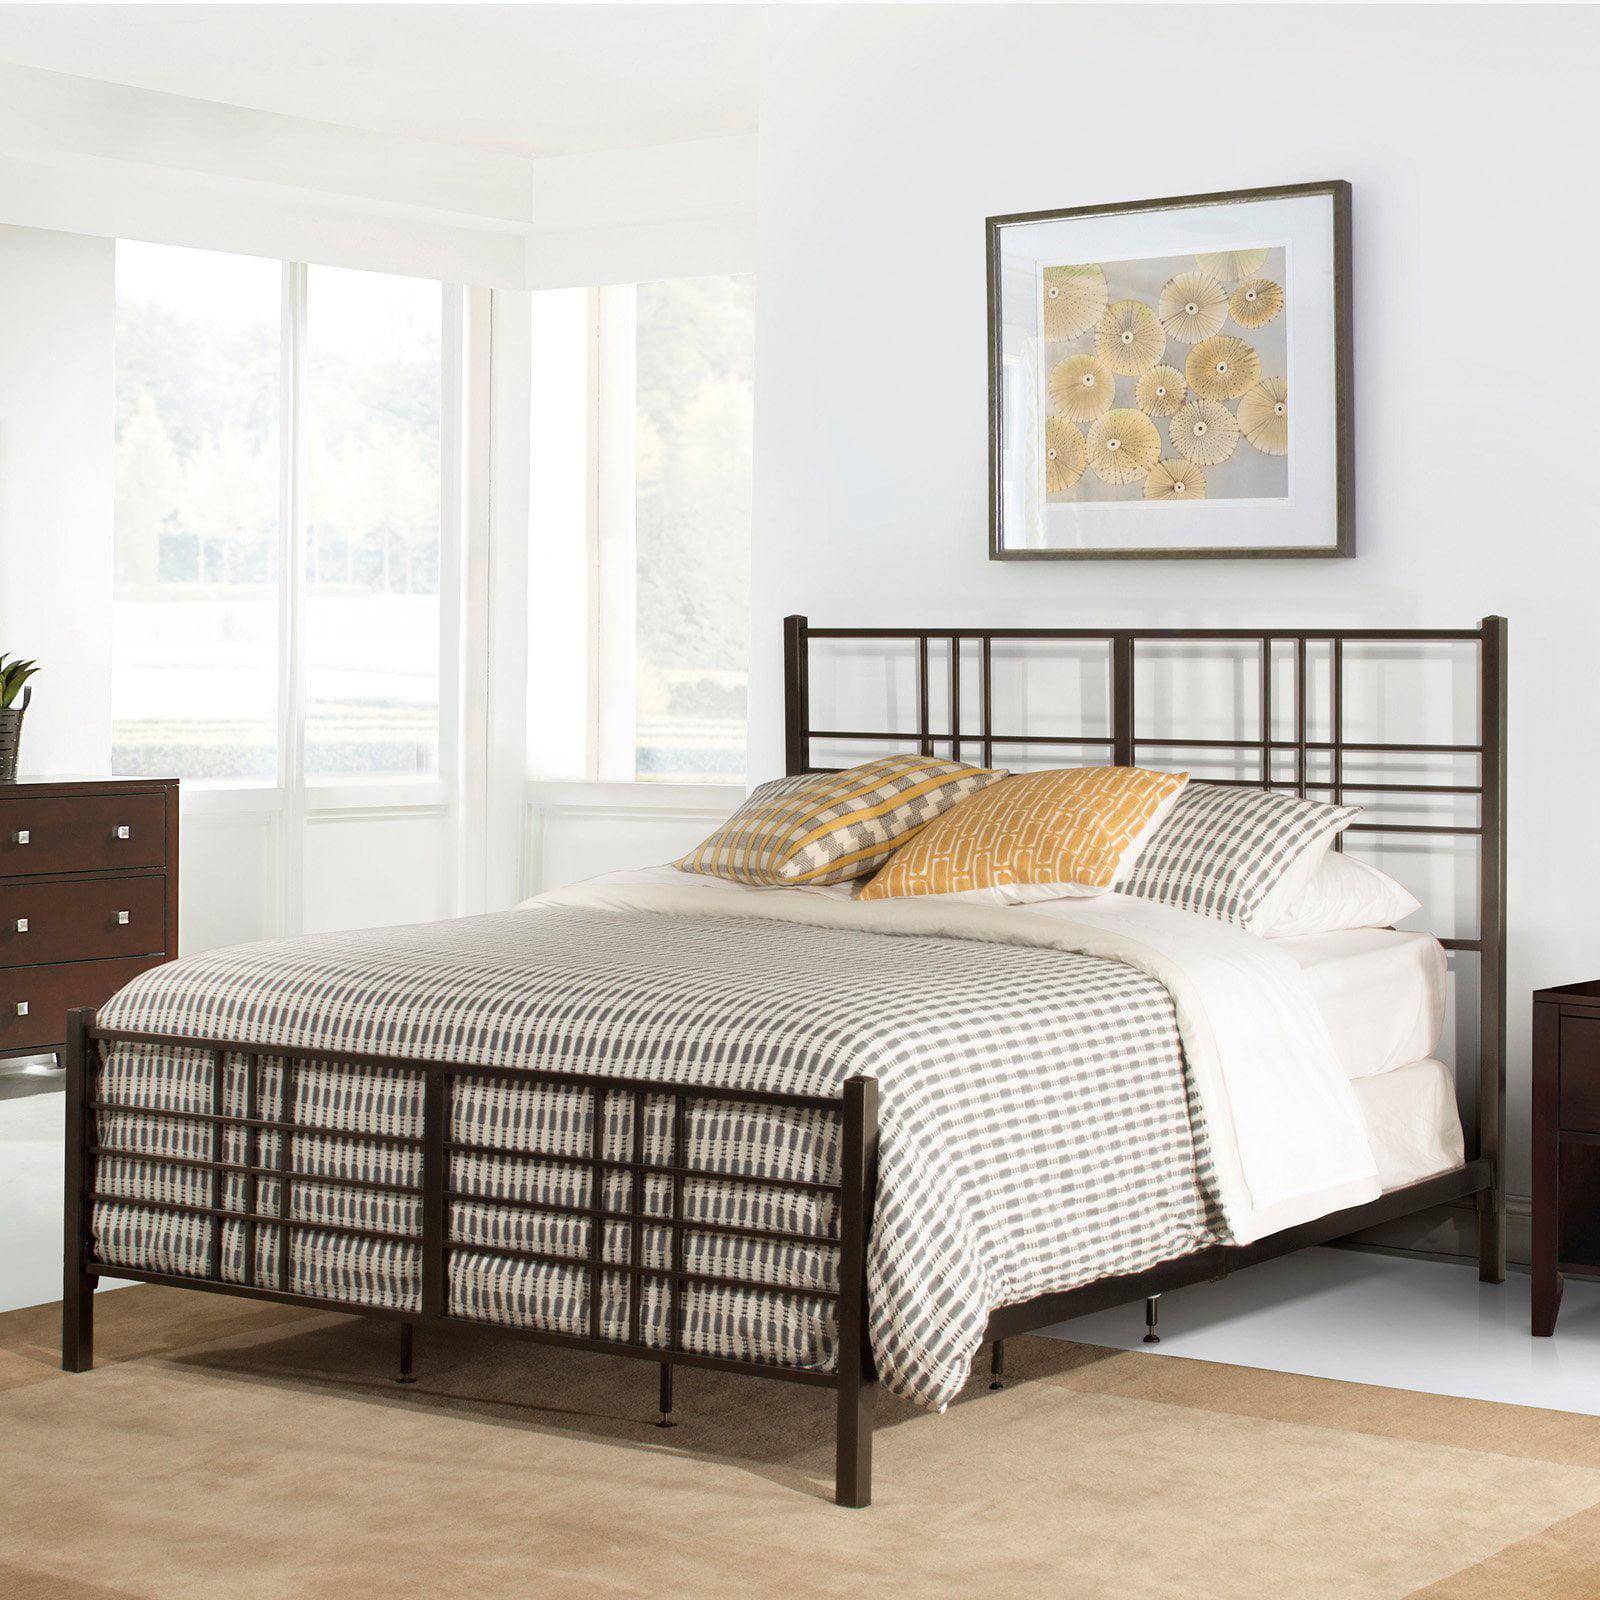 Hillsdale Furniture Manhattan Headboard with Bedframe, Multiple Sizes